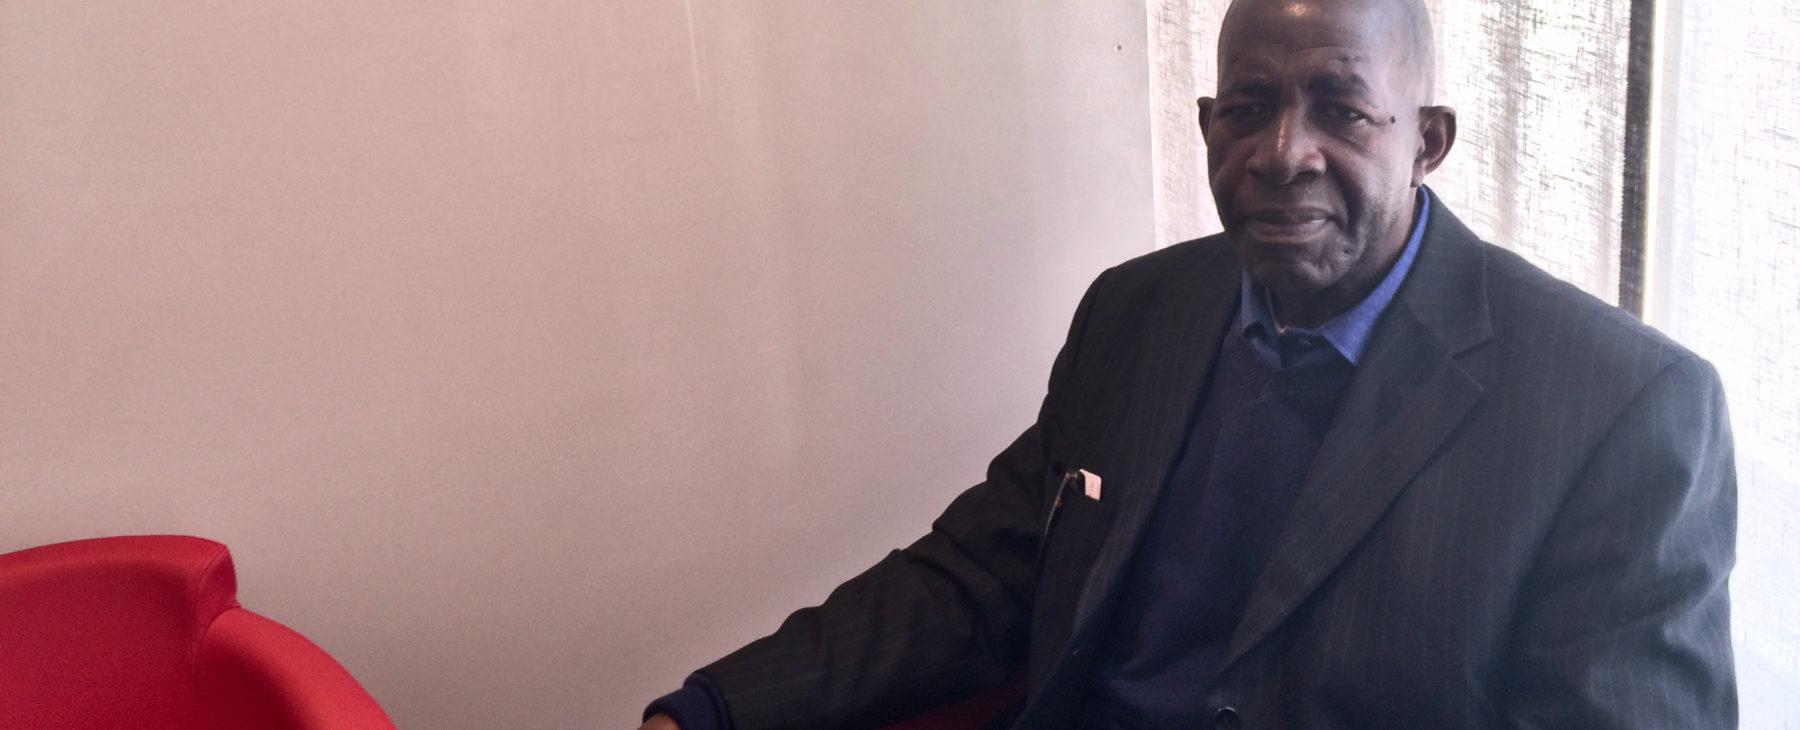 Pierre-Claver Mbonimpa: